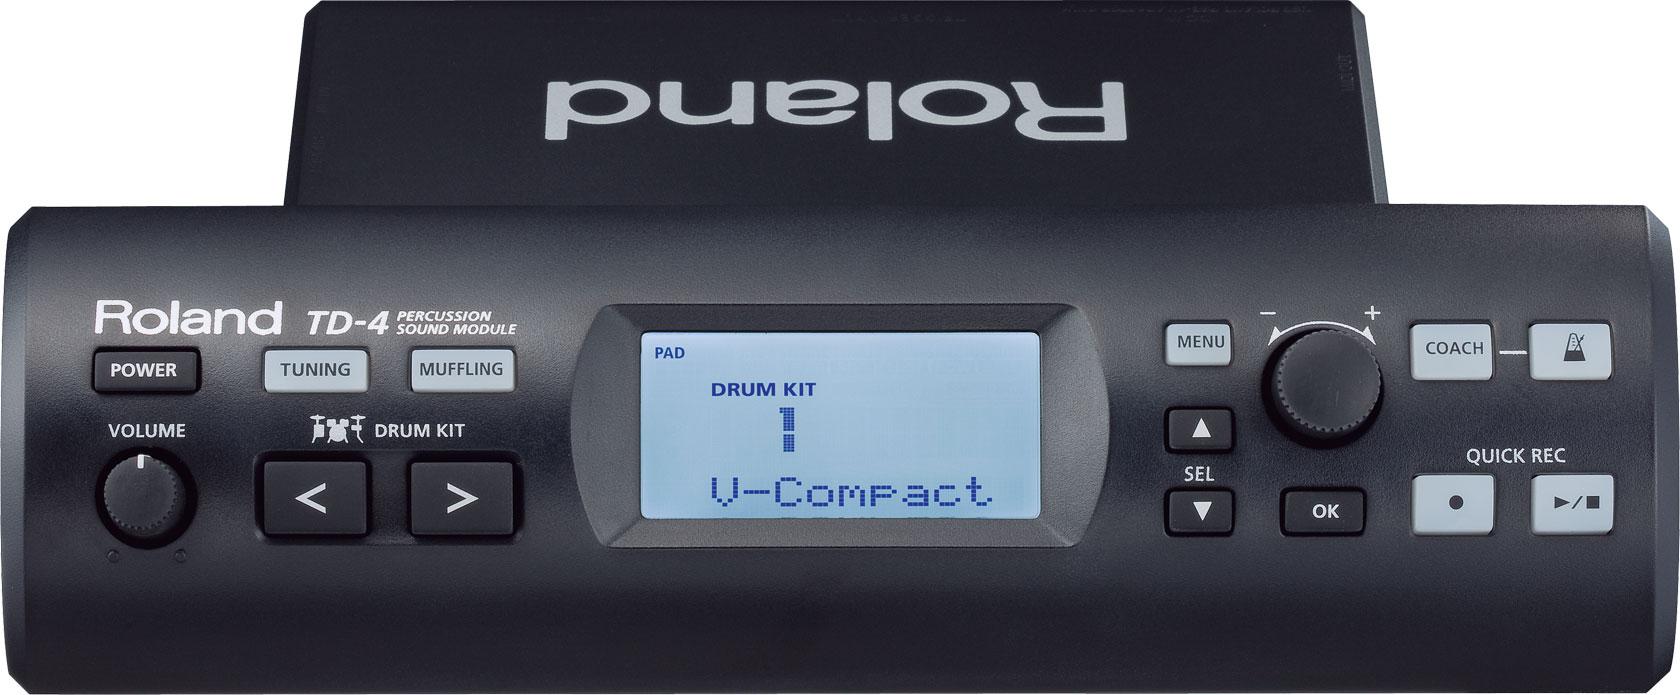 TD-4   Percussion Sound Module - Roland